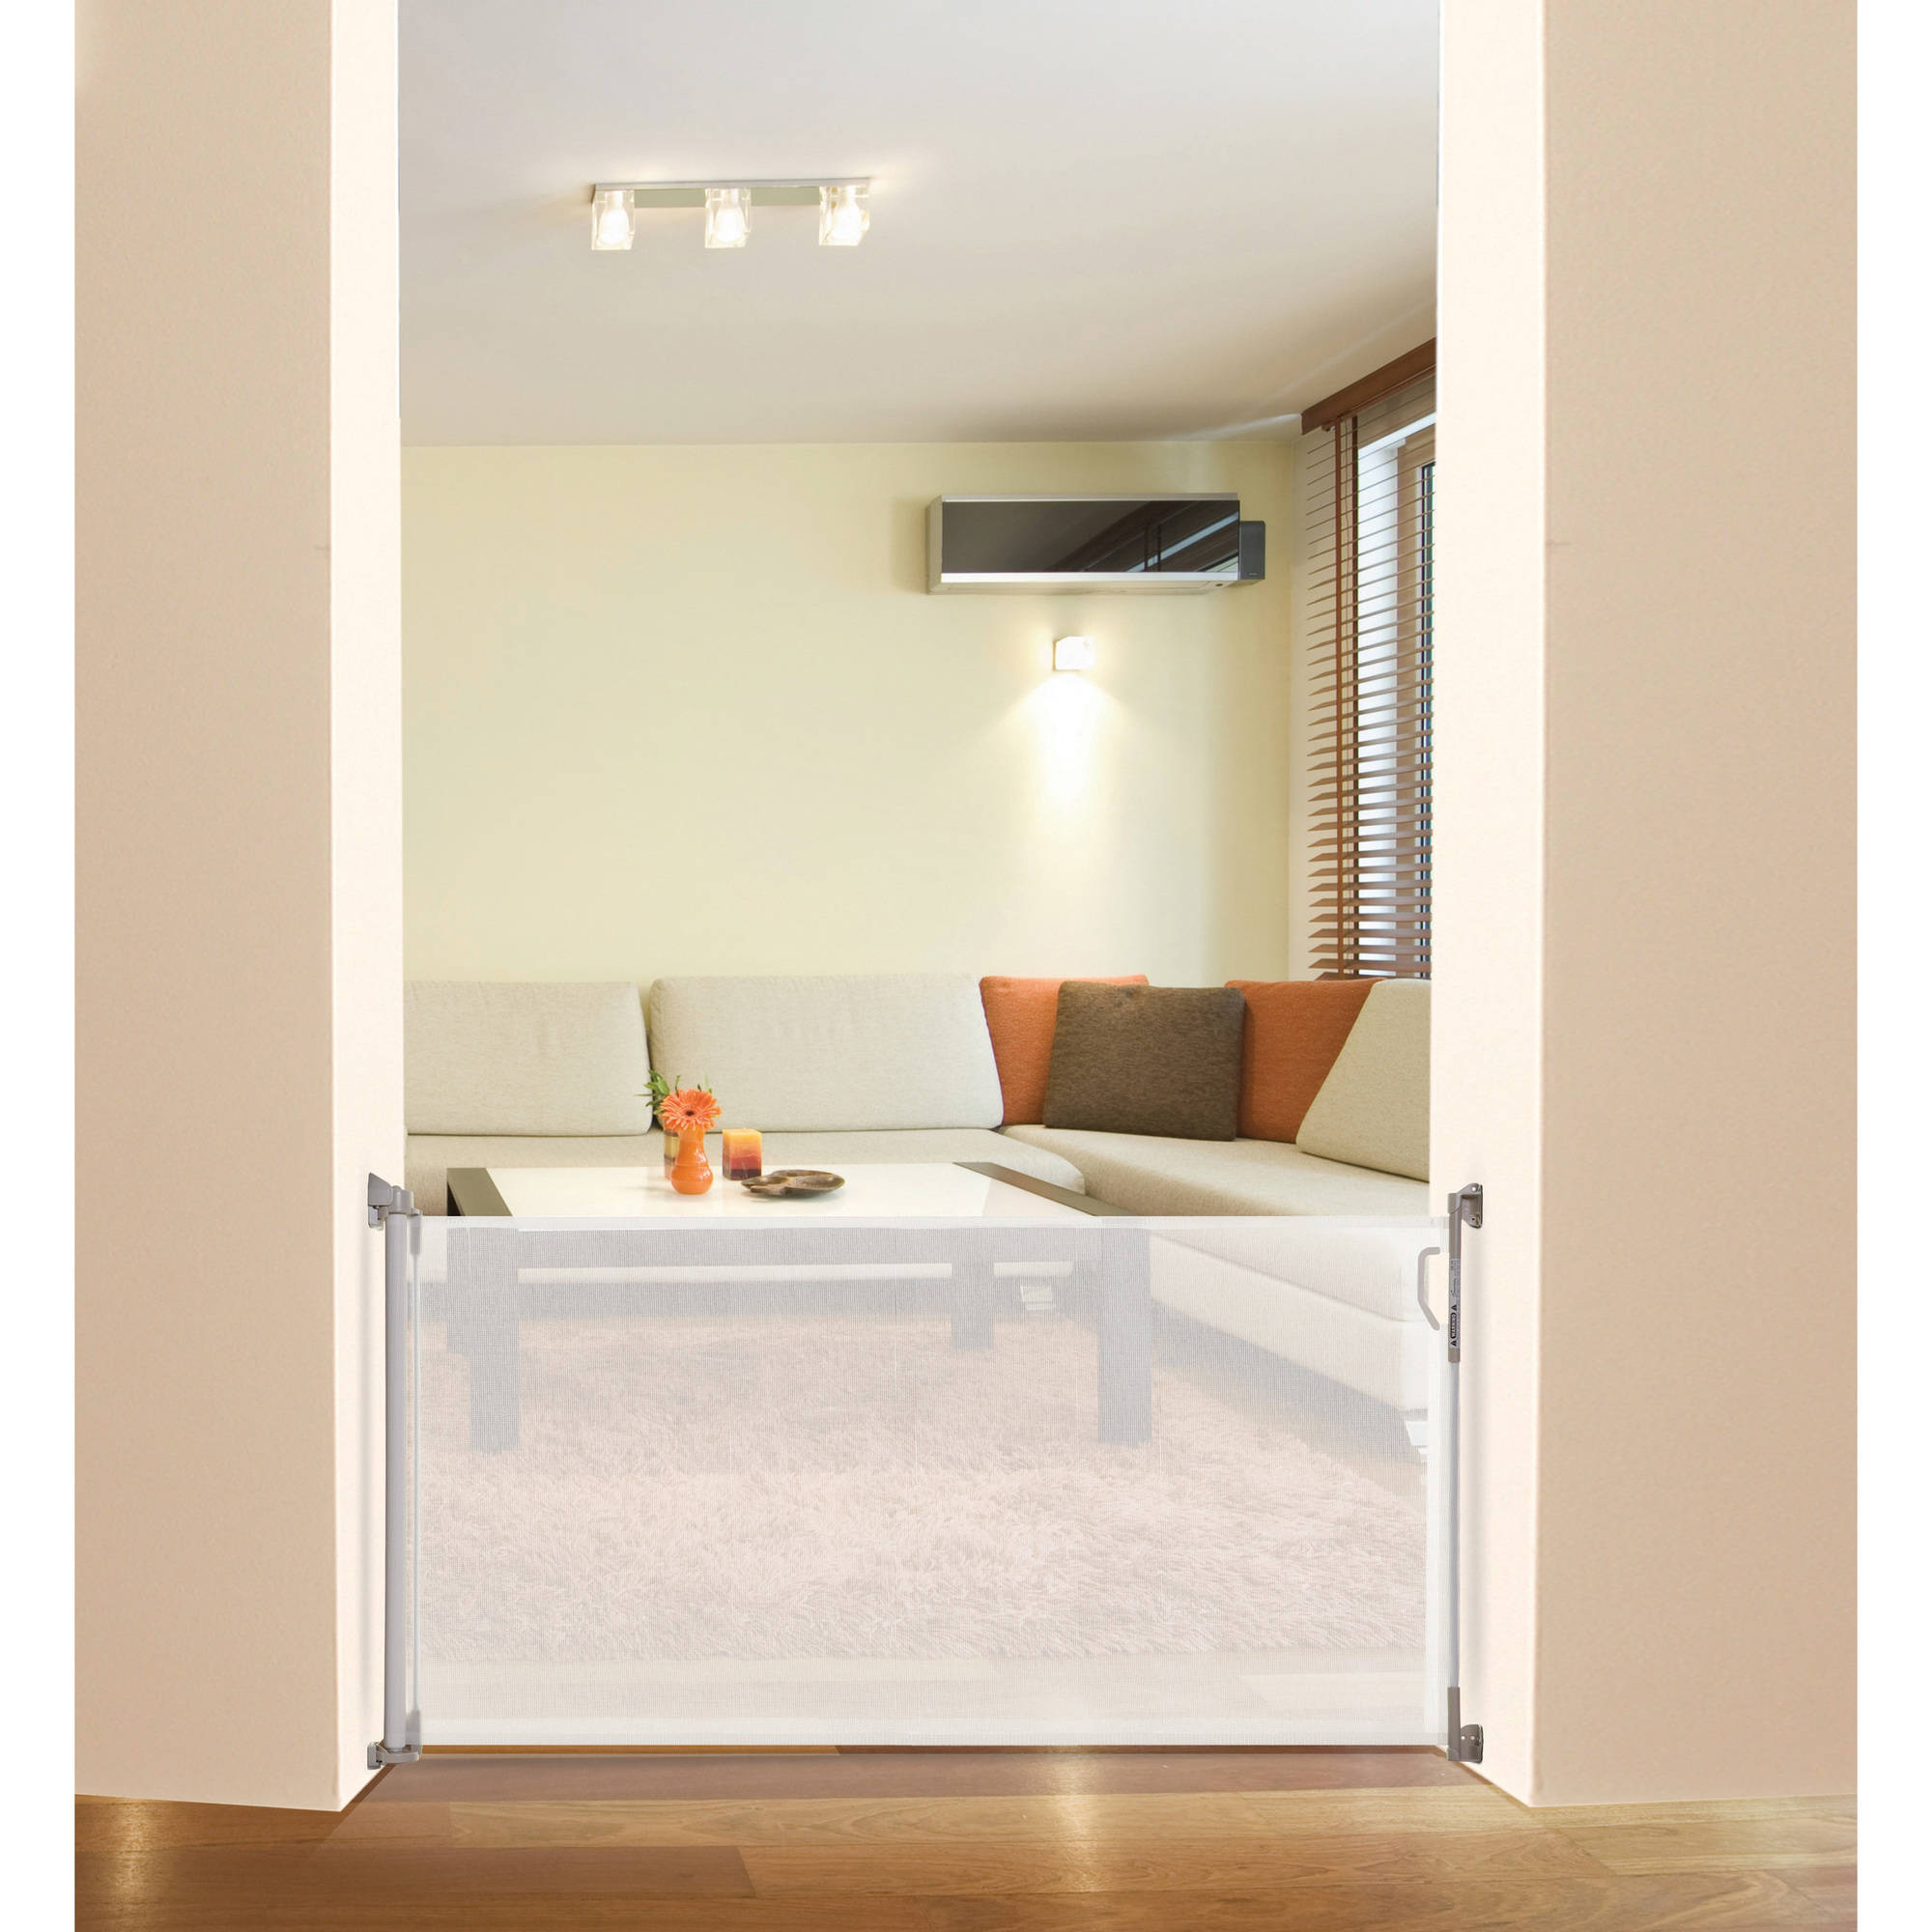 dreambaby retractable indooroutdoor security gate white  - dreambaby retractable indooroutdoor security gate white  walmartcom